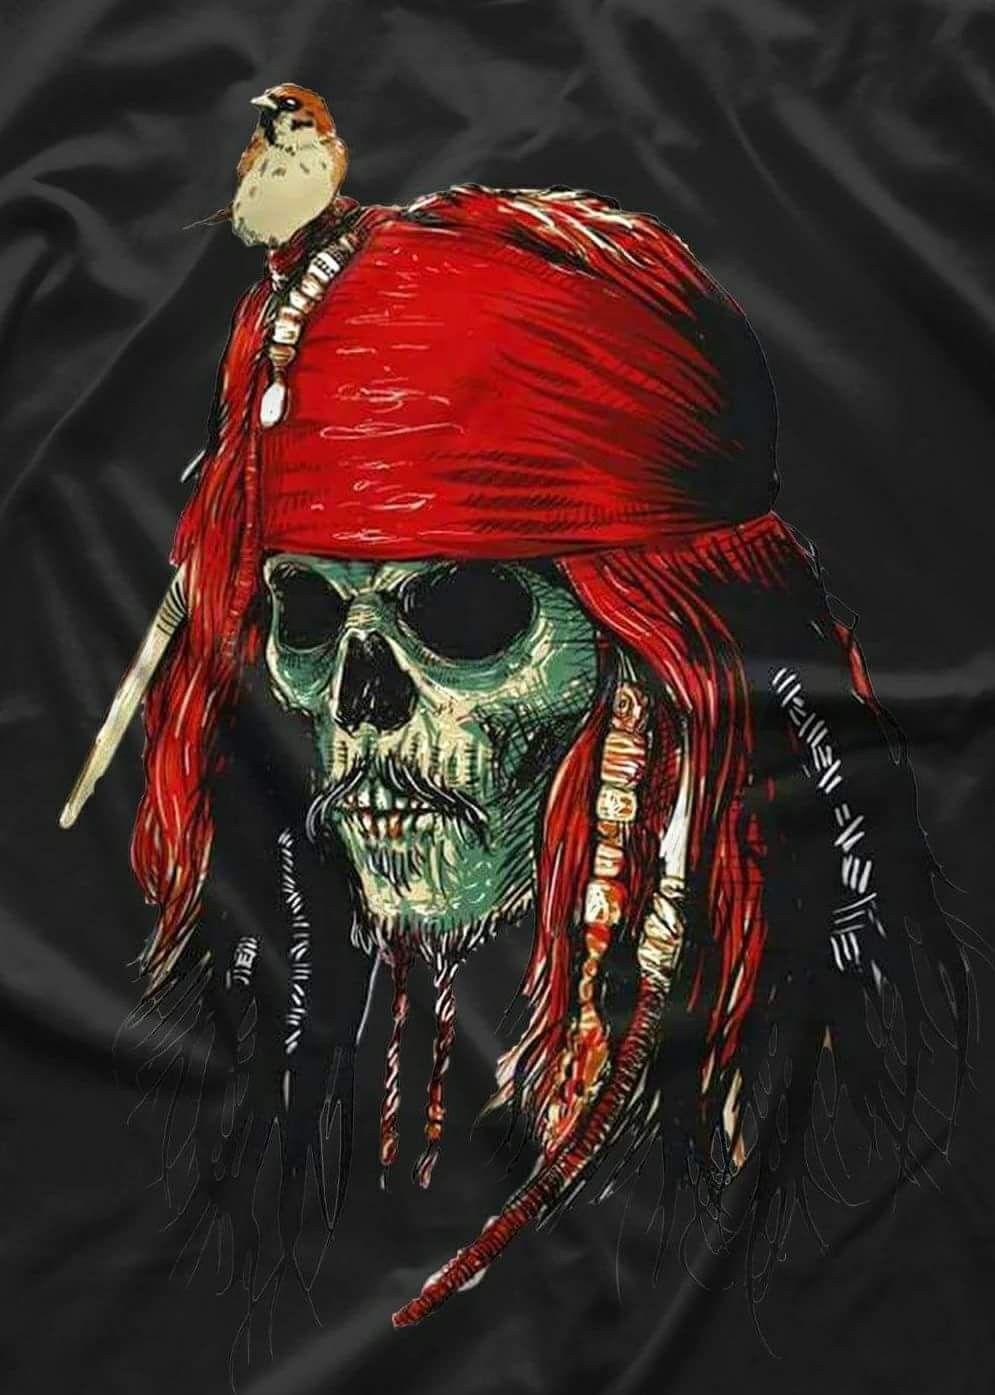 Pin by Sarah Downey on Captain Jack Sparrow/POTC   Gas ...